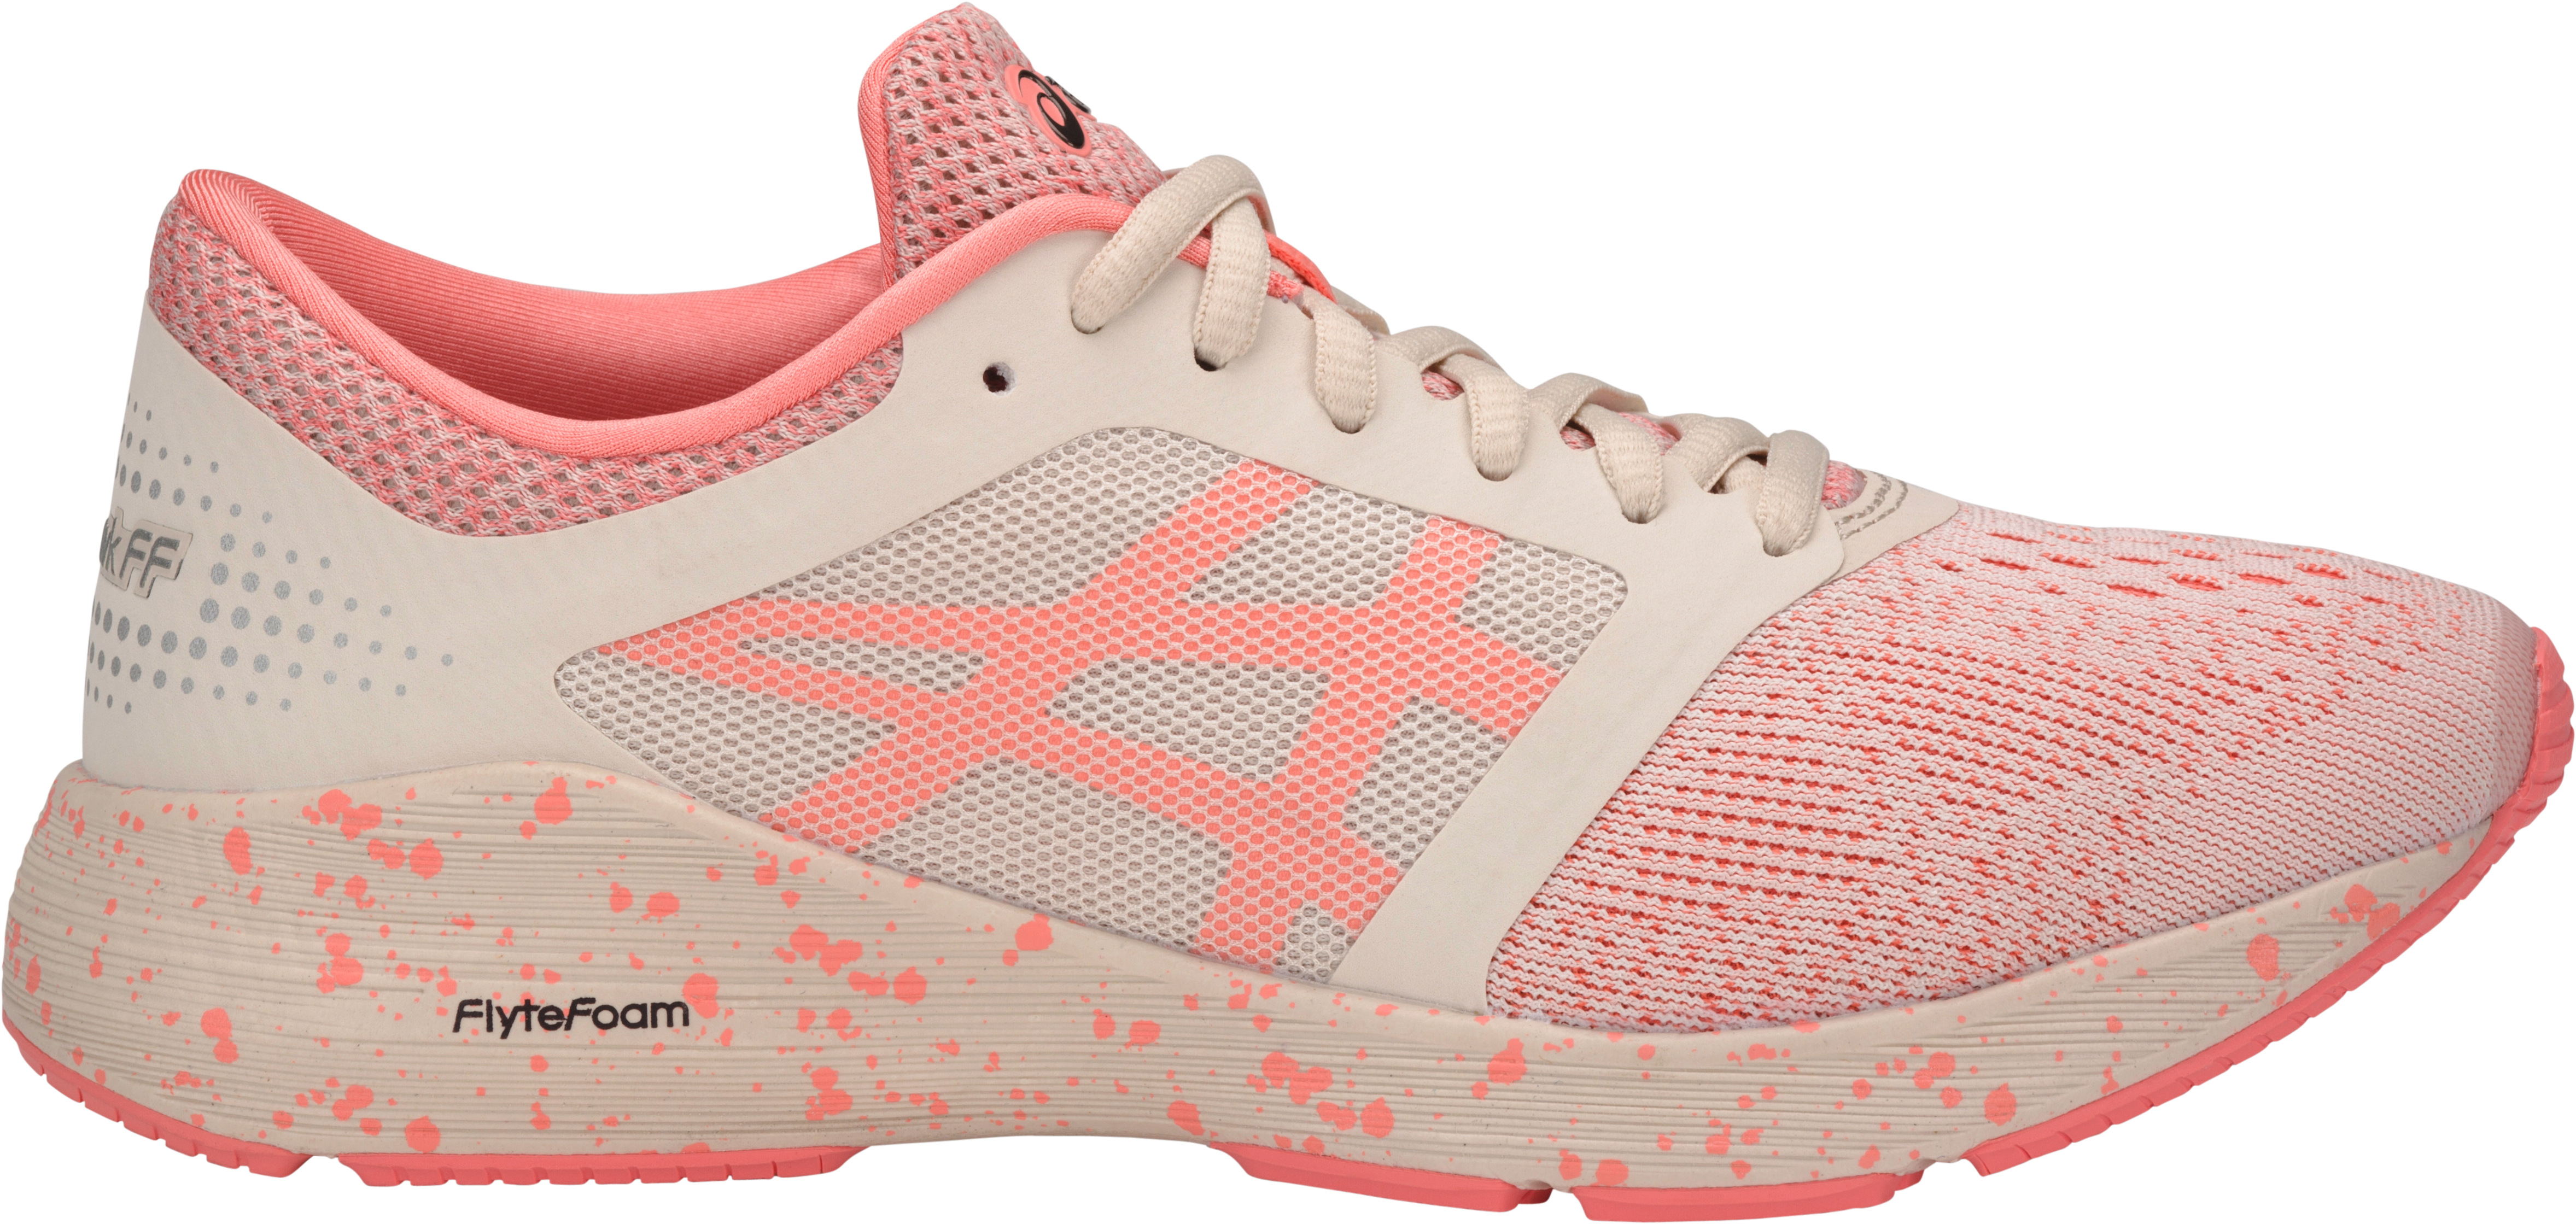 2cbbe964826 Asics Roadhawk FF SP Road Running Shoes - Women s